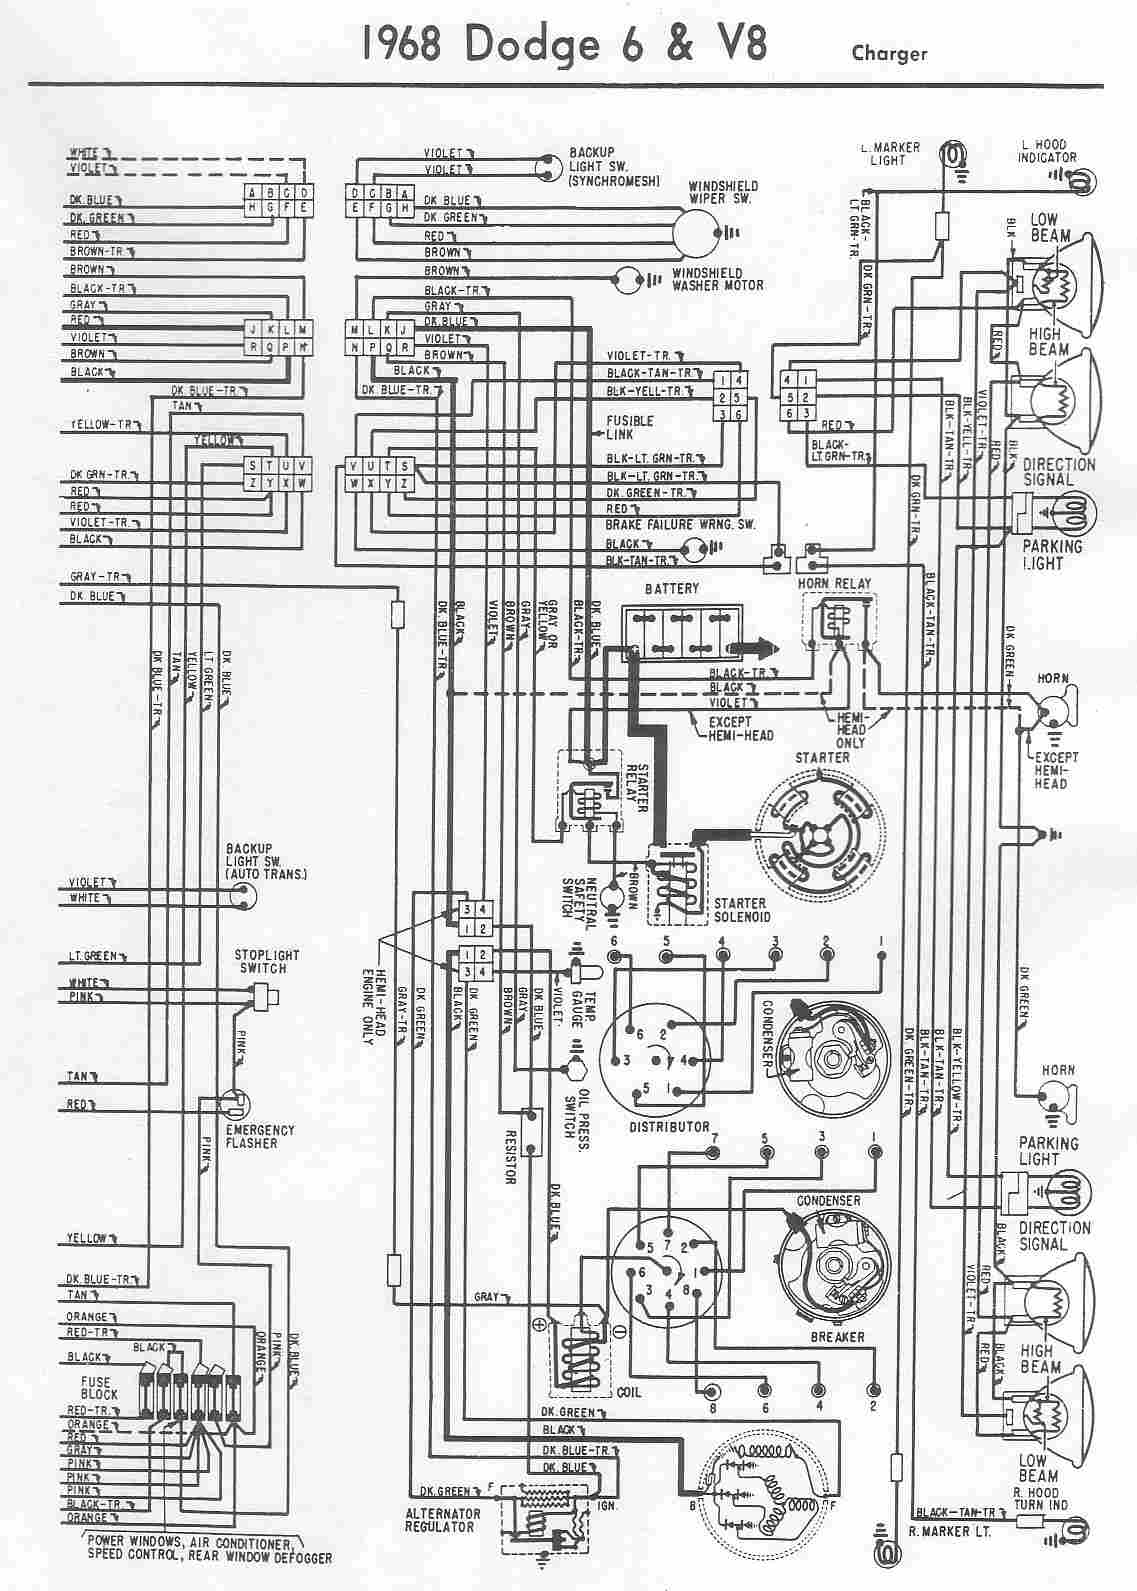 1985 Plymouth Voyager Fuse Box Diagram Electrical Wiring Diagrams Chrysler Lebaron Cadillac Allante